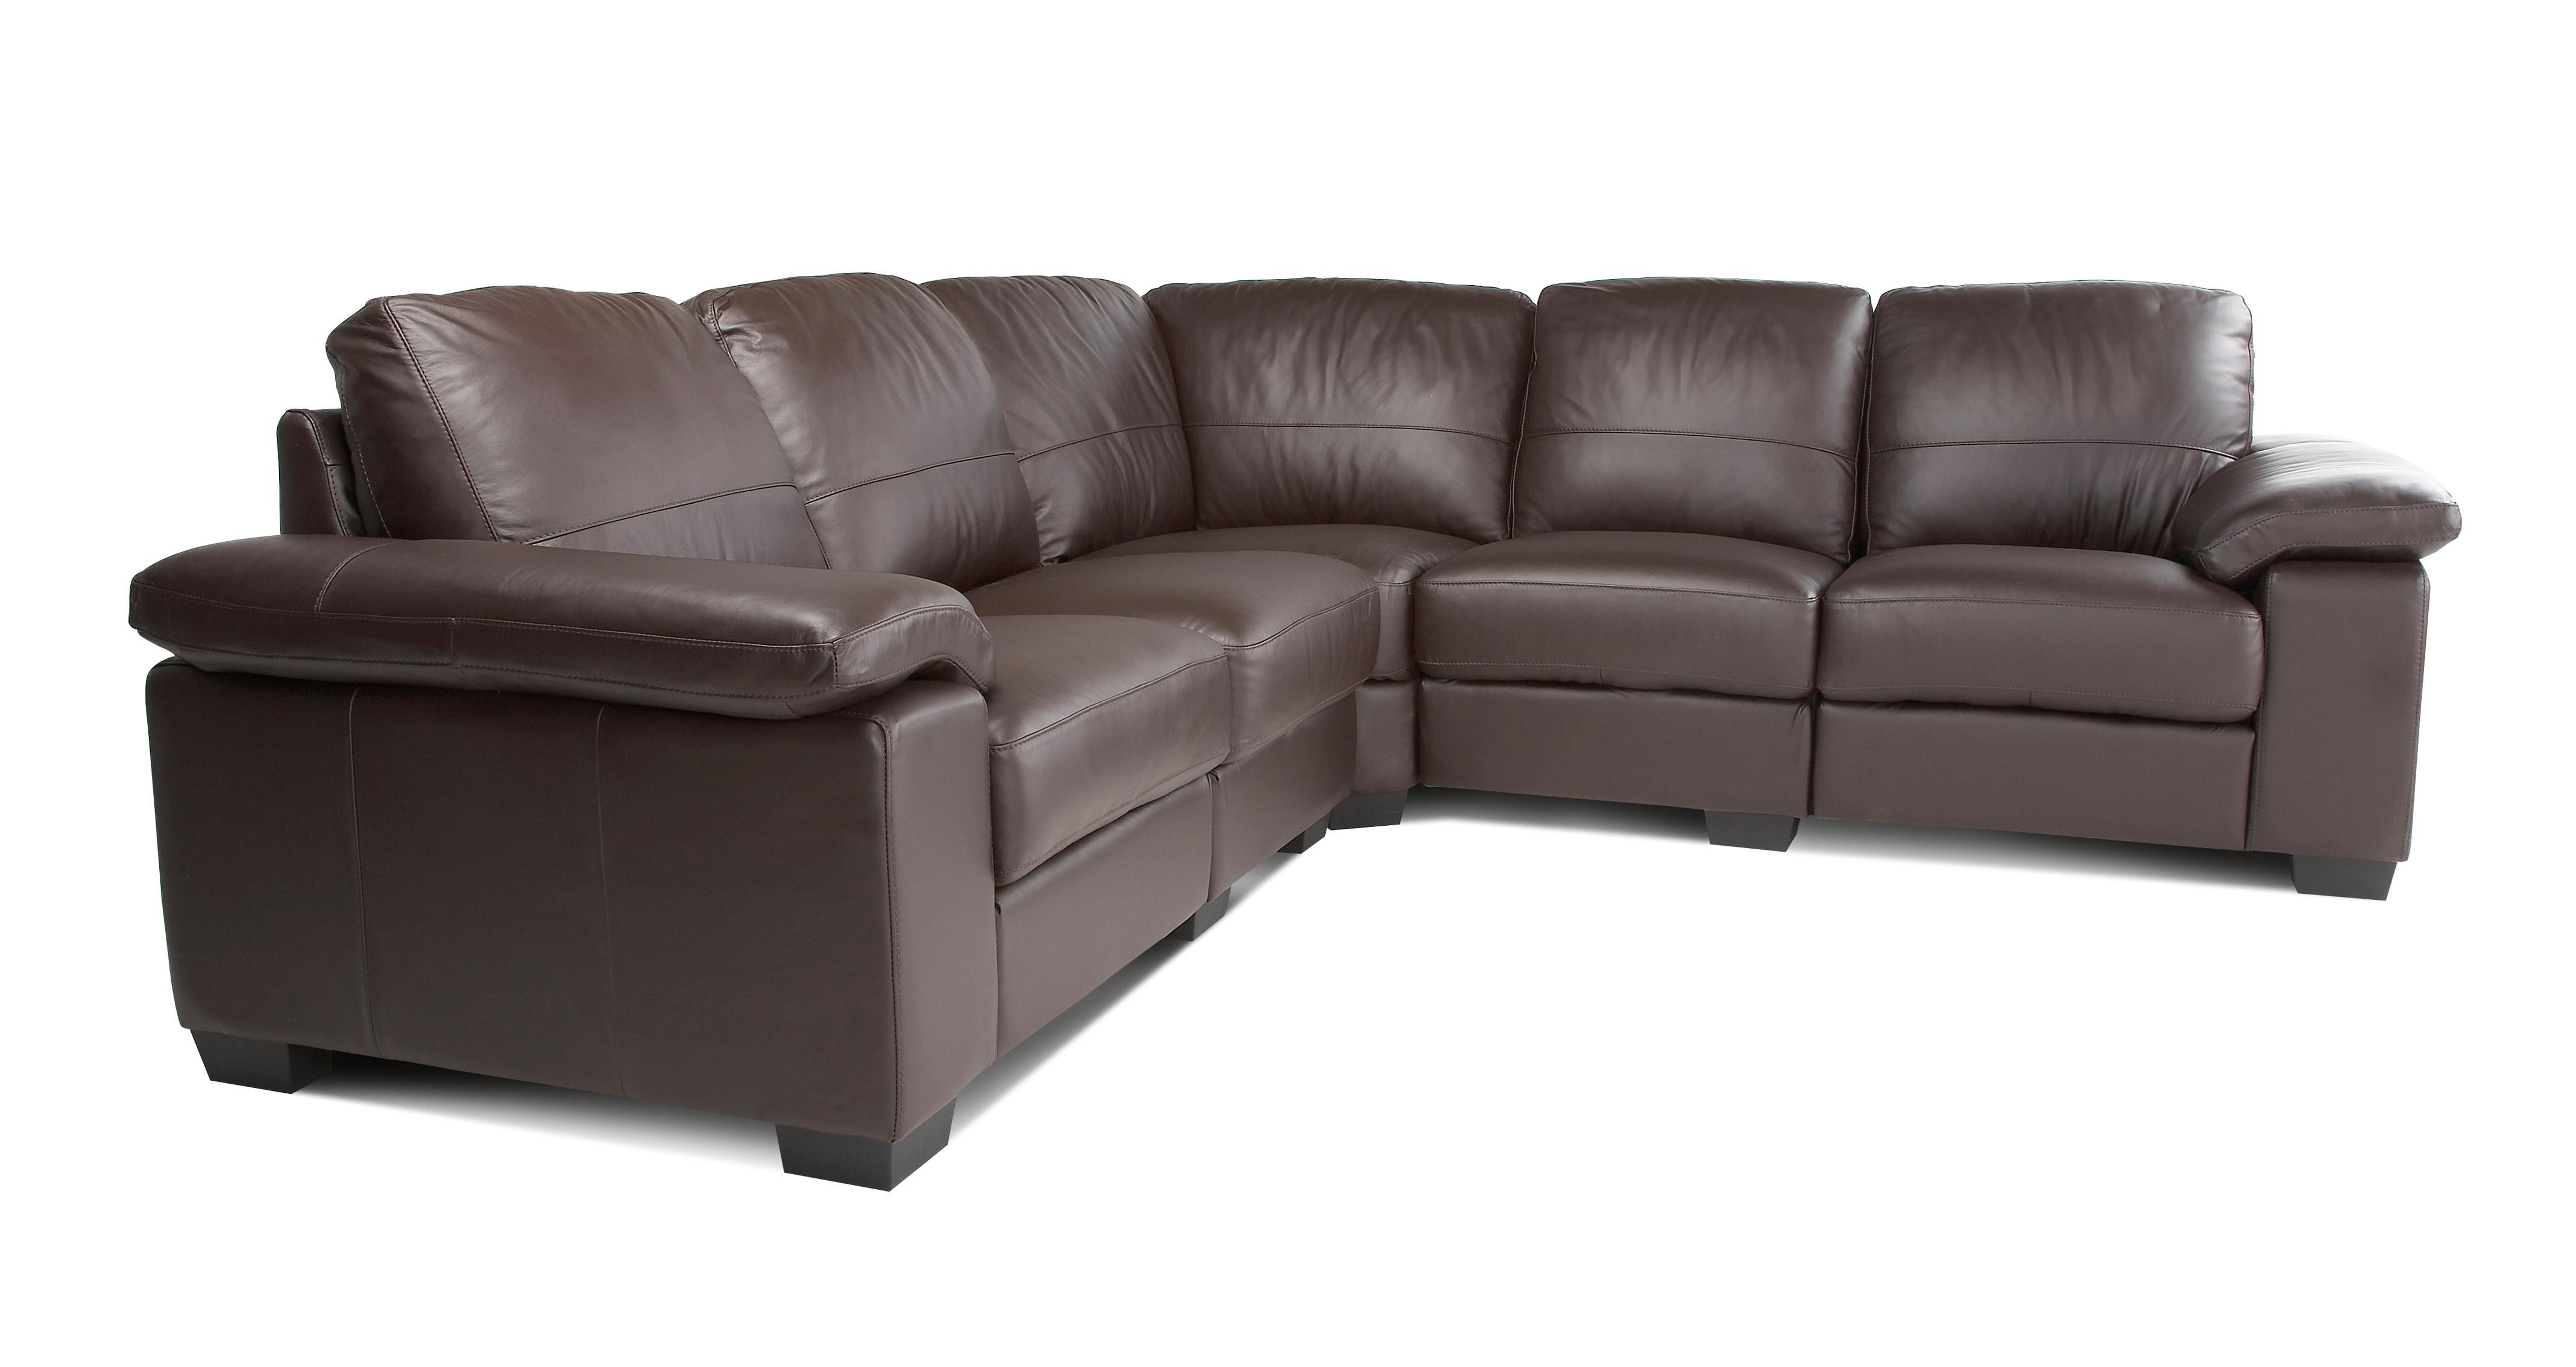 Linea Bedroom Furniture Linea Corner Group Accent Dfs